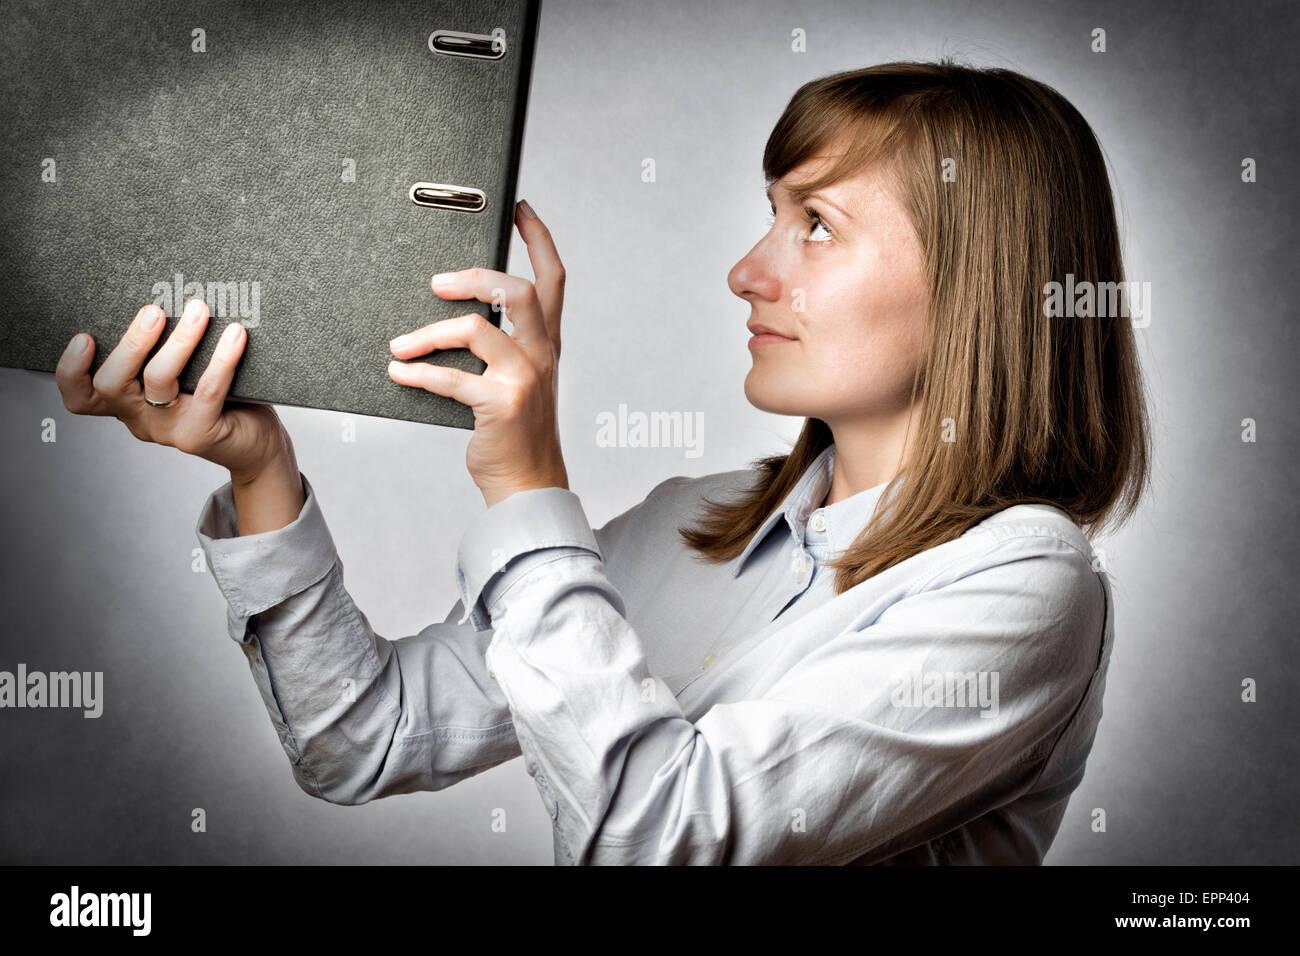 Female office worker puts a folder in a shelf - Stock Image